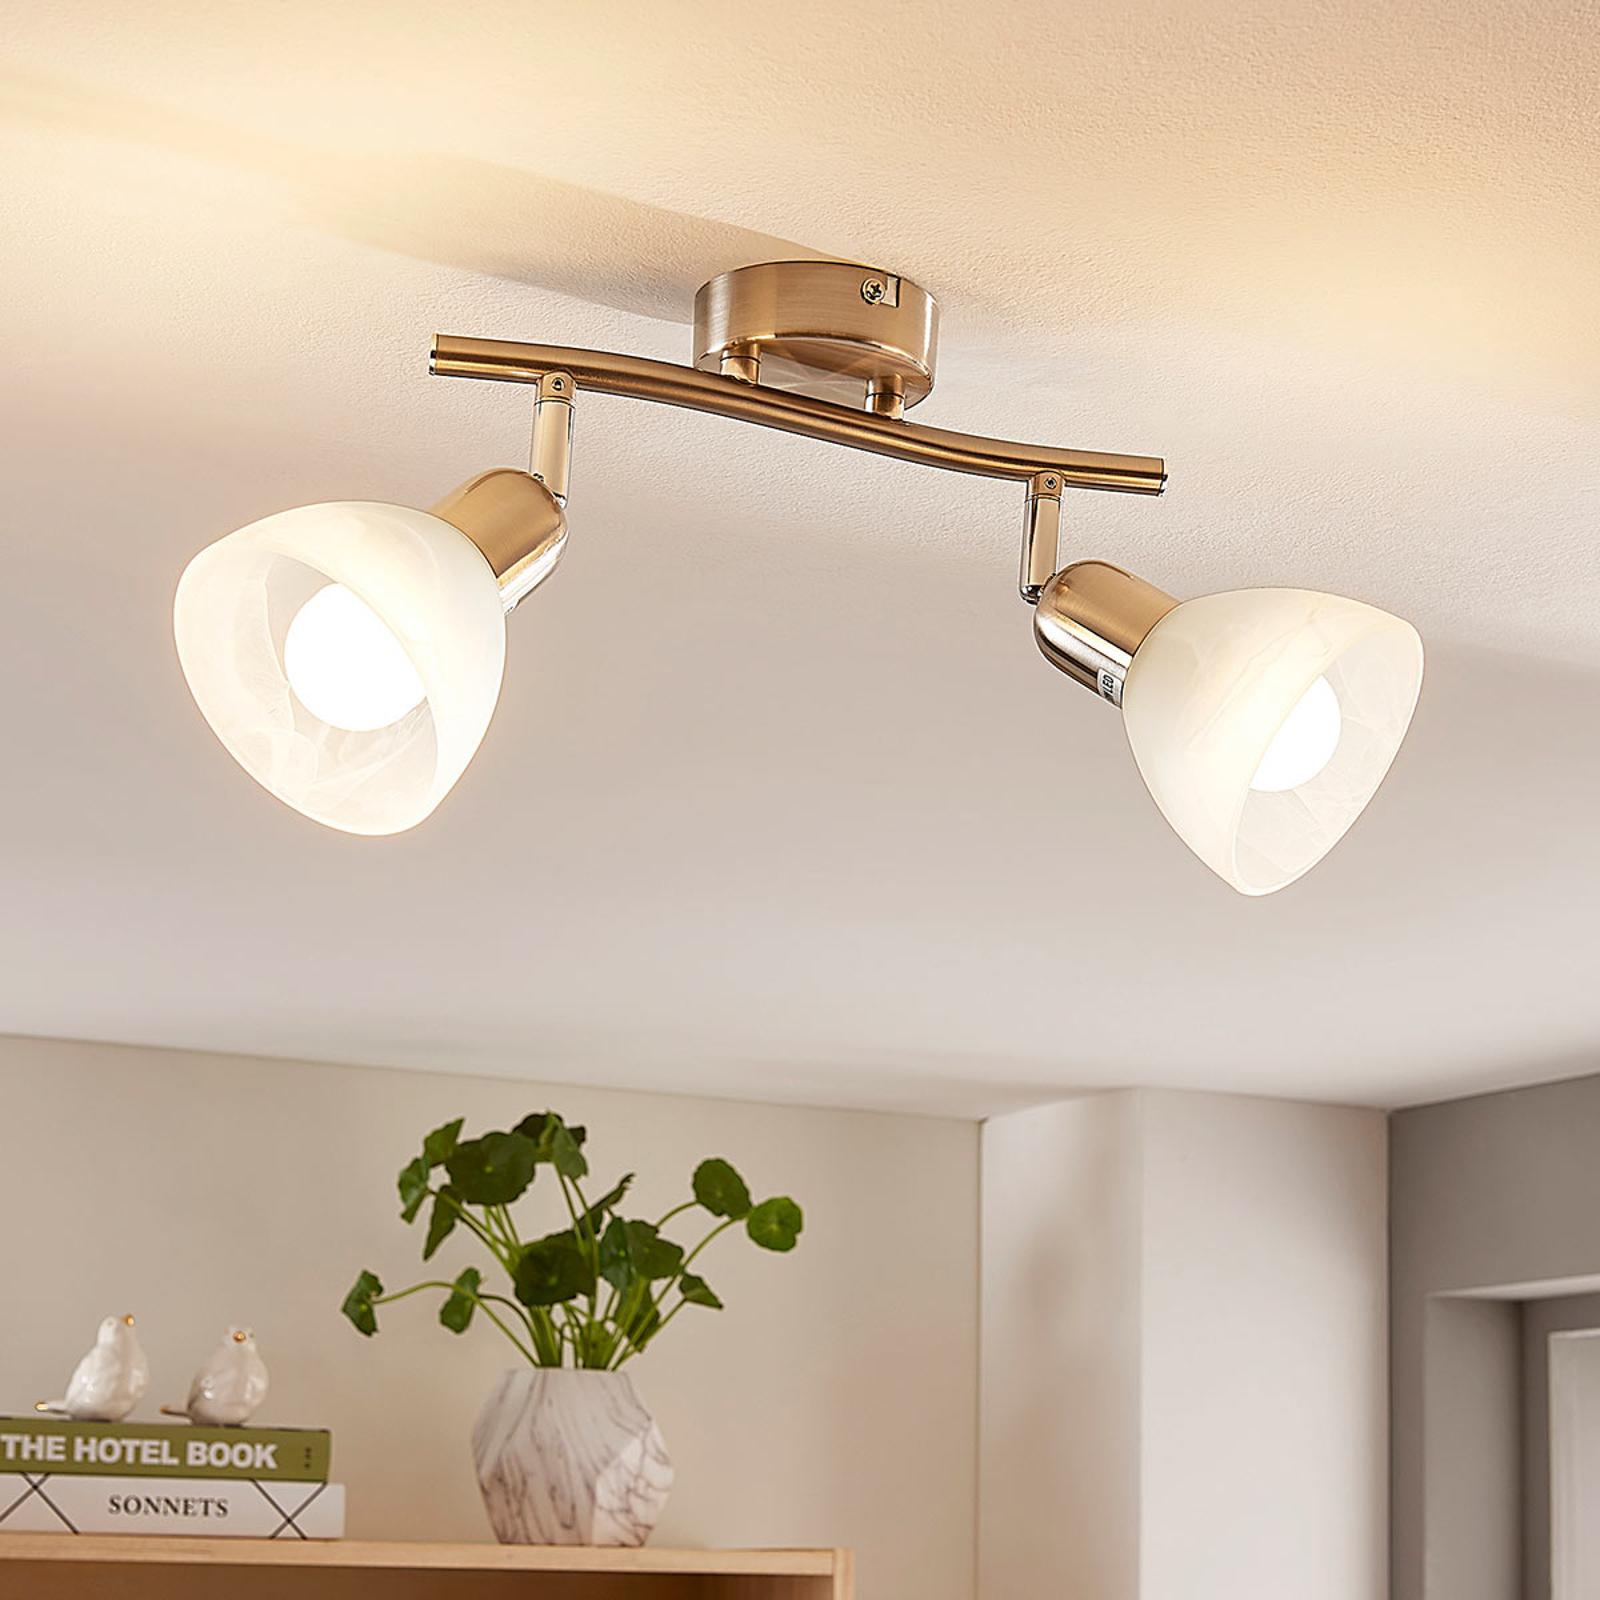 Two-bulb LED ceiling light Paulina, nickel-col._9621640_1